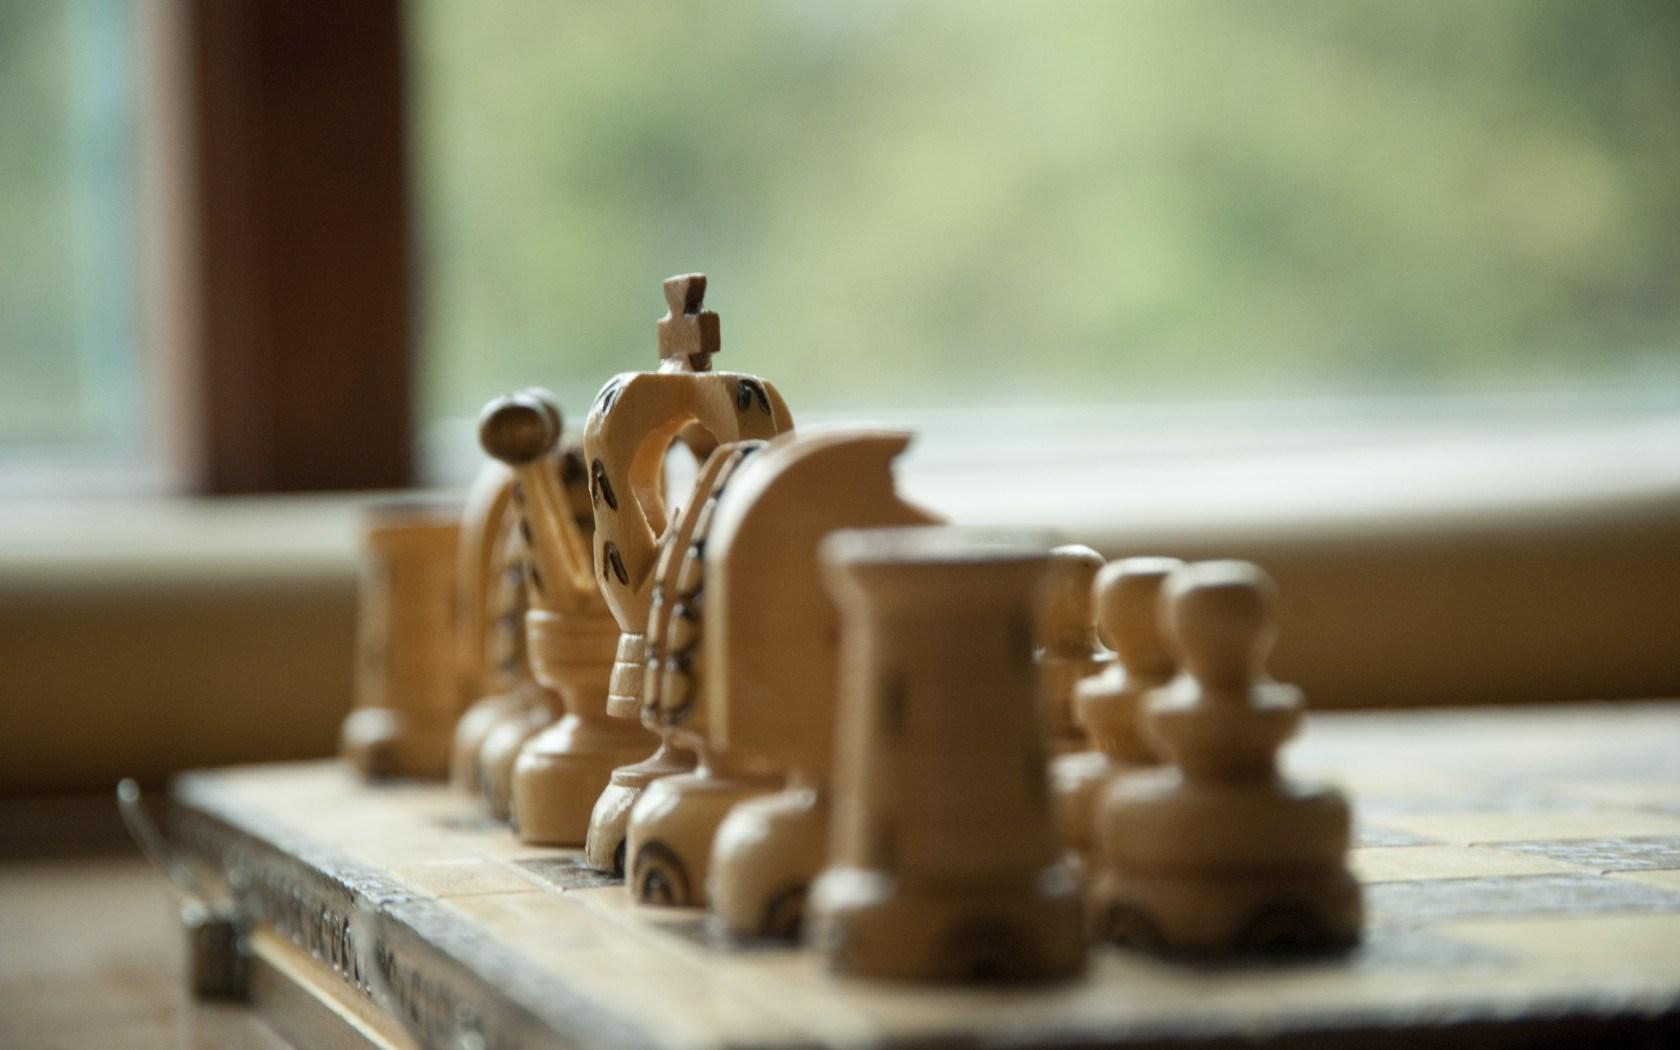 Cute Queen Wallpaper Chess Pieces Wood Game Hd Desktop Wallpapers 4k Hd